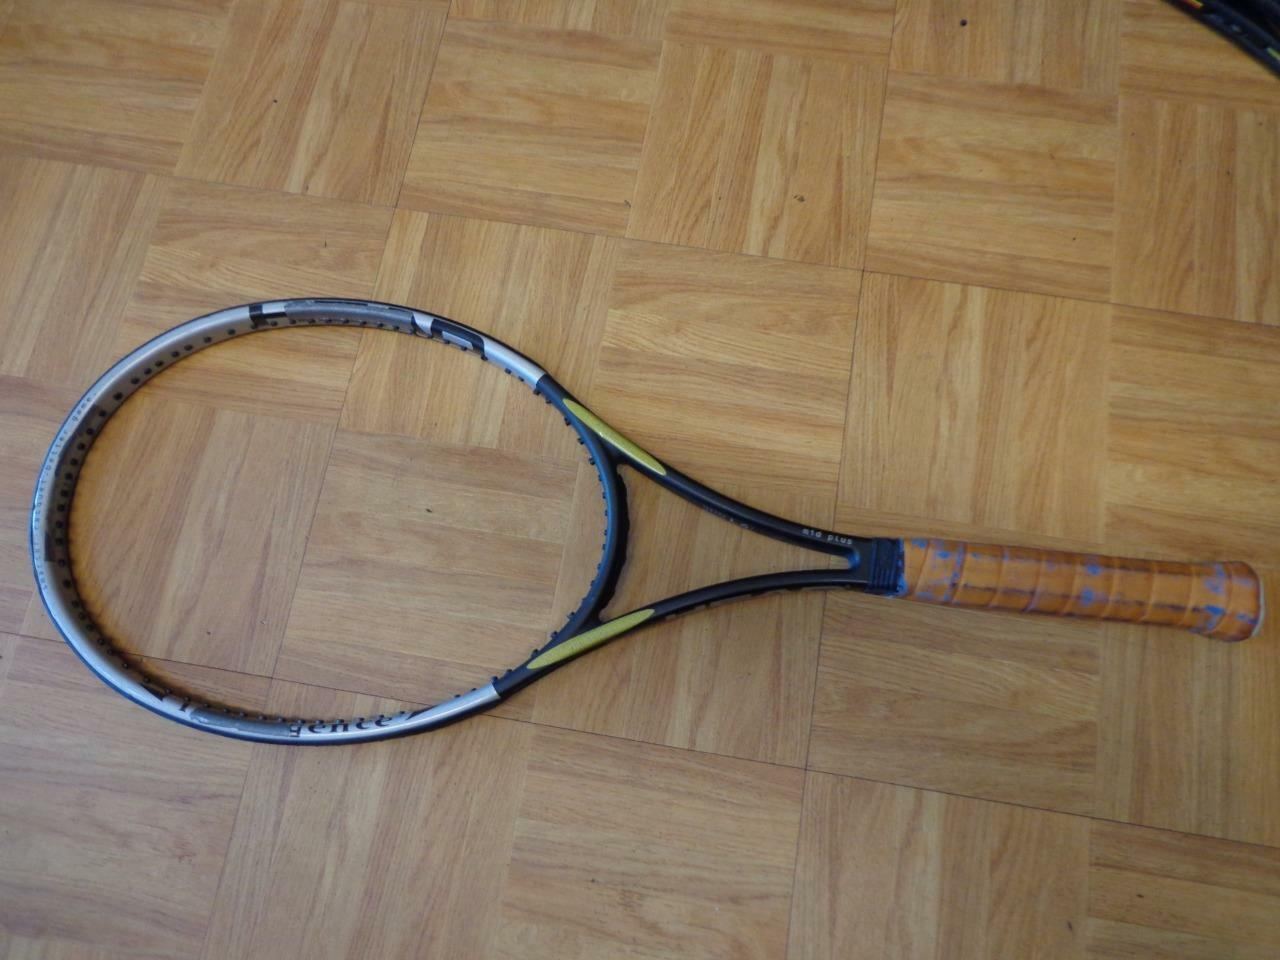 Cabeza I. Prestige Midplus 98 Hecho En Austria 4 1 2 Grip Tenis Raqueta